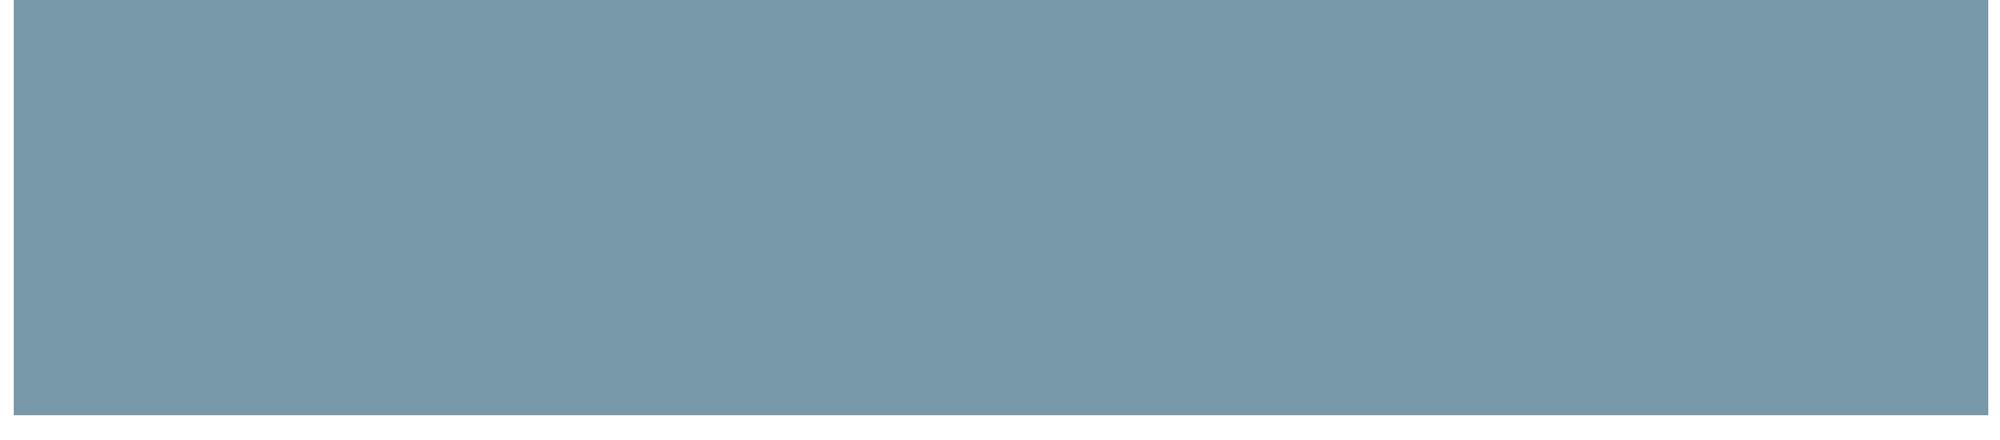 allstate-blue